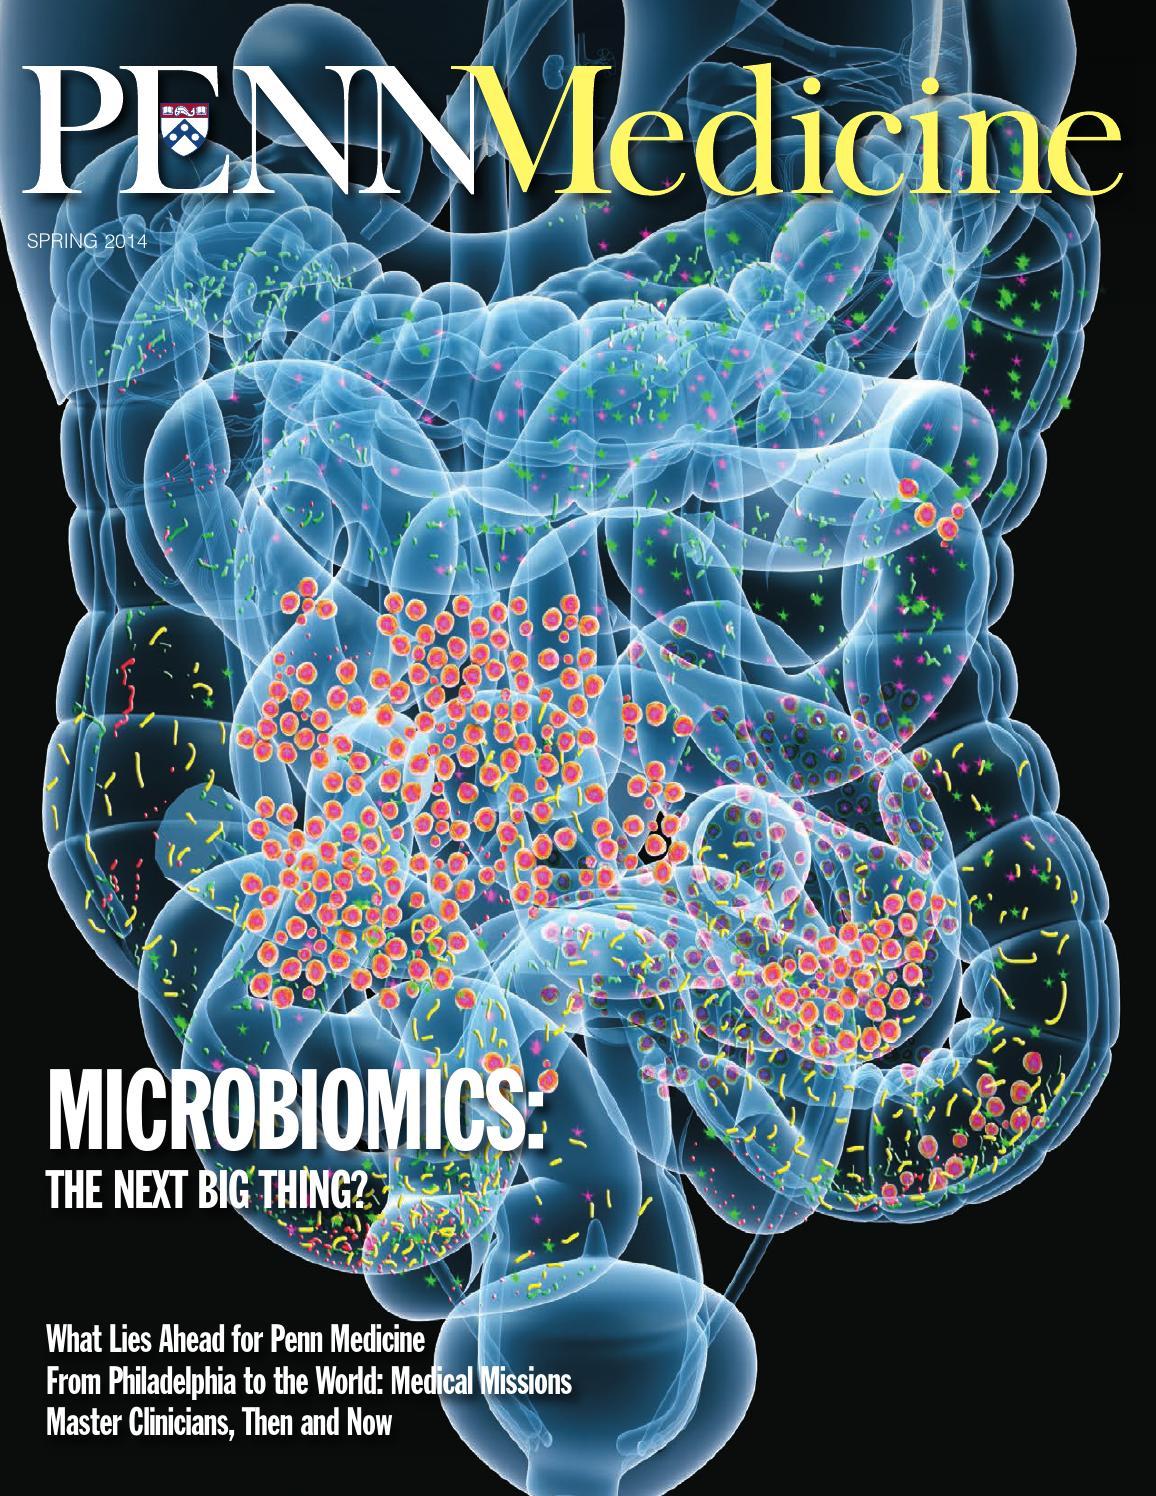 Penn Medicine Magazine Spring 2014 by Penn Medicine - issuu